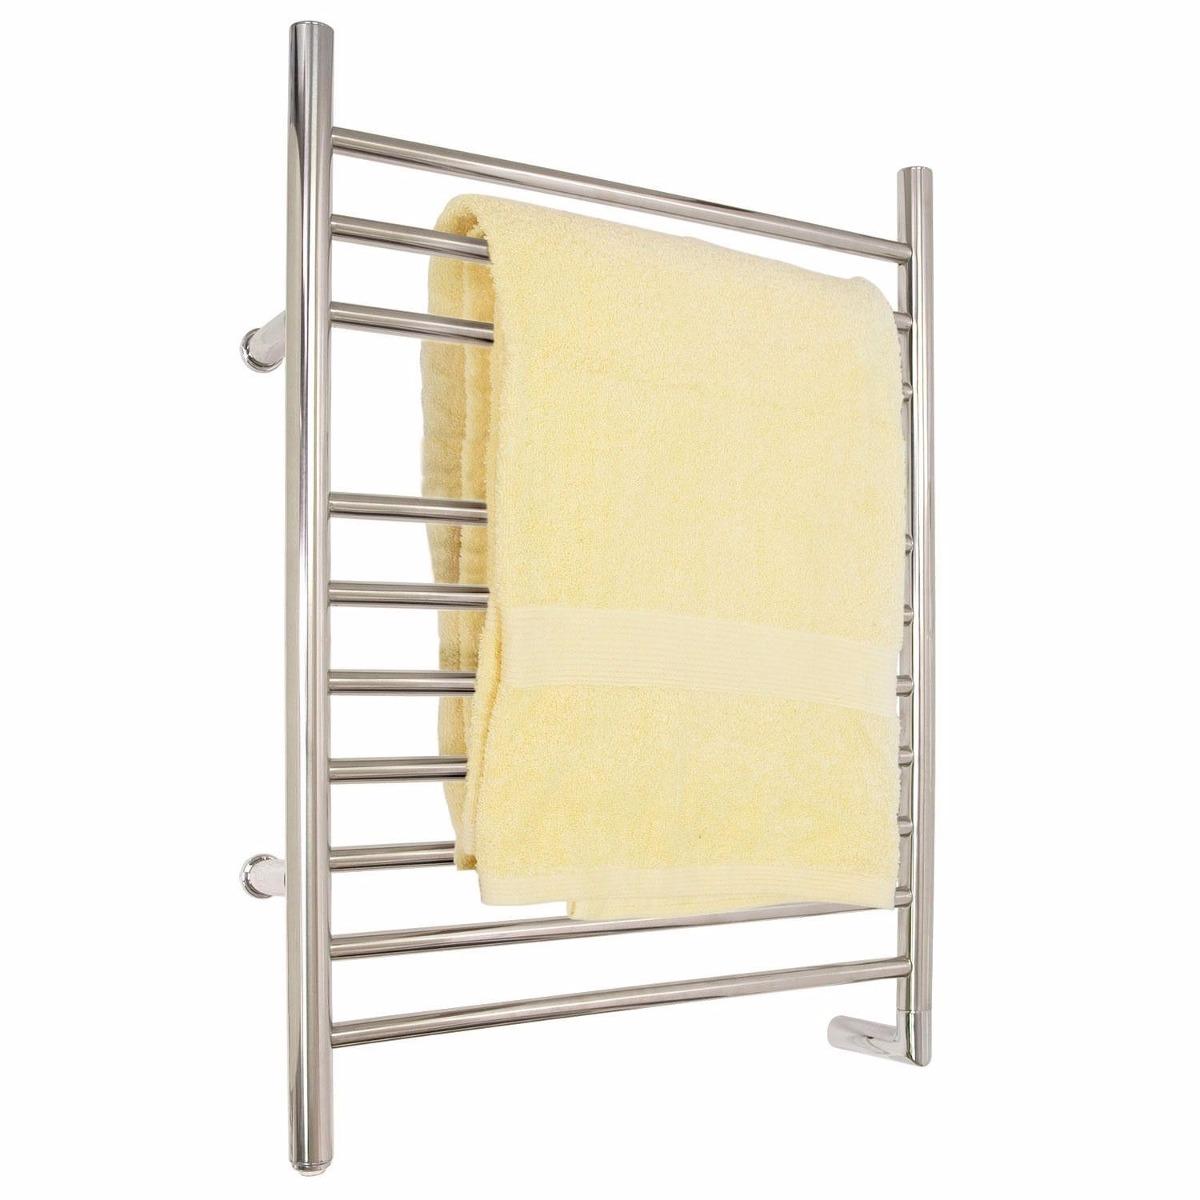 Calentador de toallas electrico acero inoxidable toallero for Toallero acero inoxidable